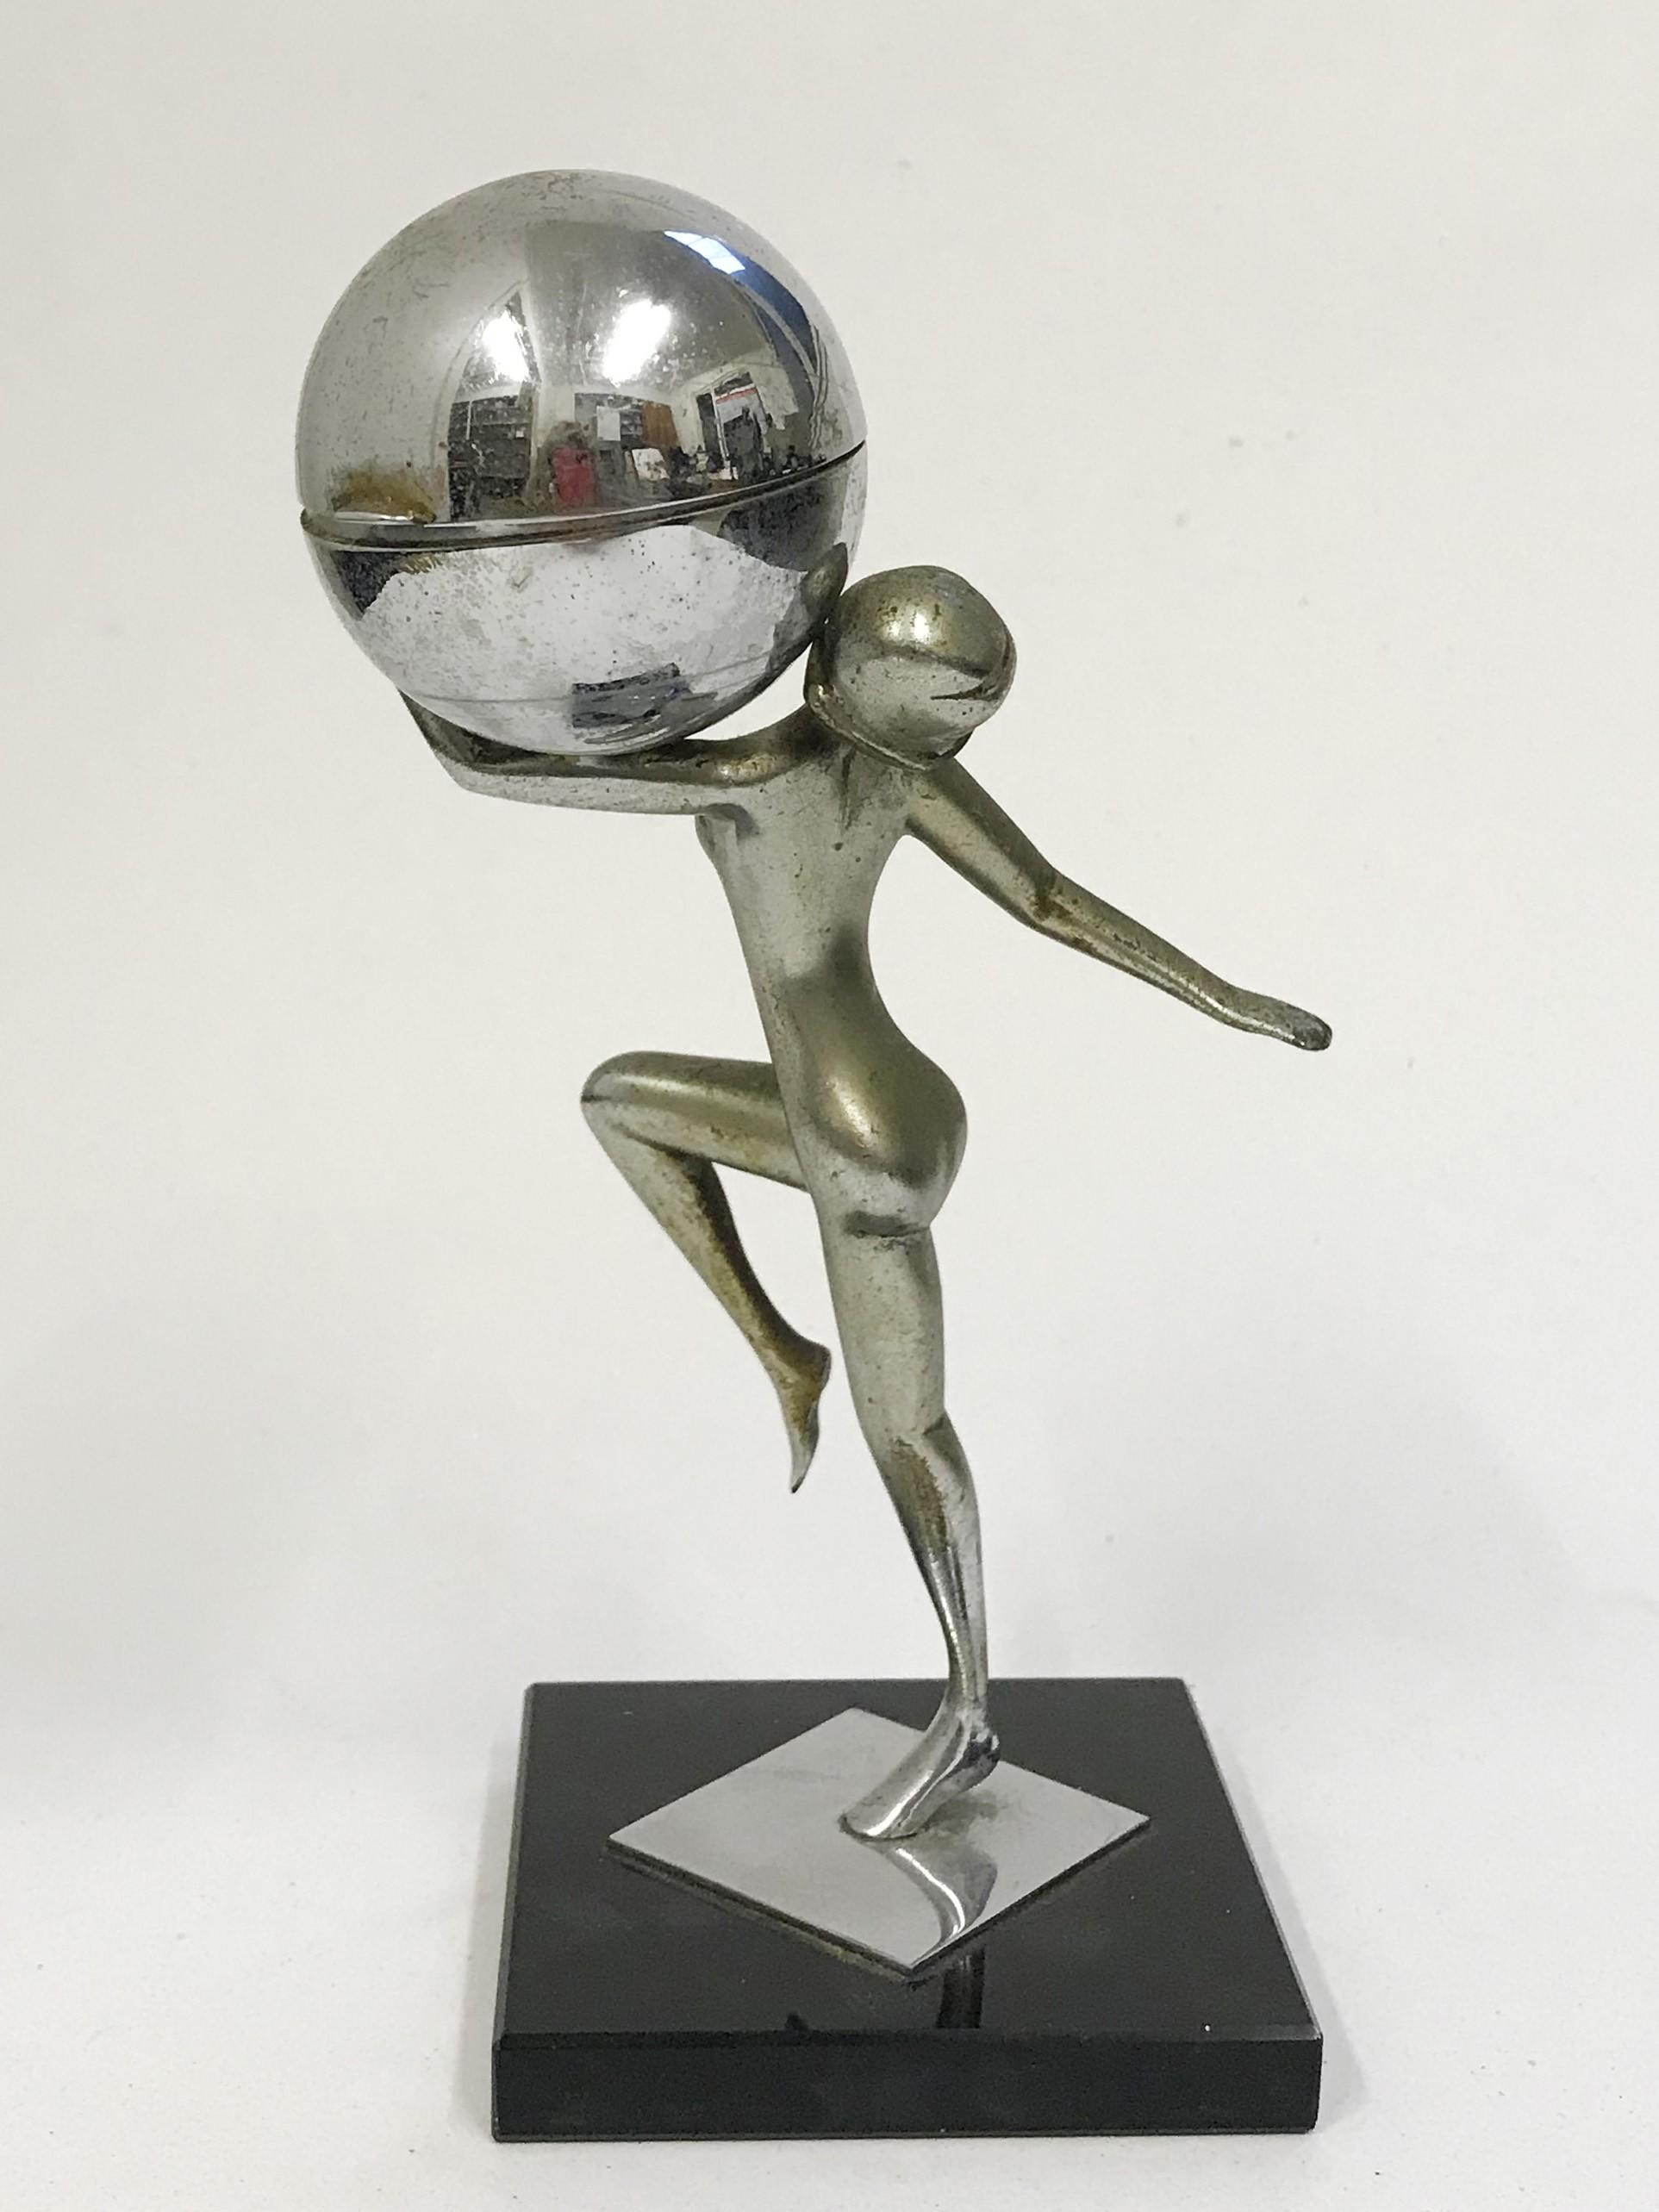 Lot 30A - Art Deco Lady & Globe Table Lighter